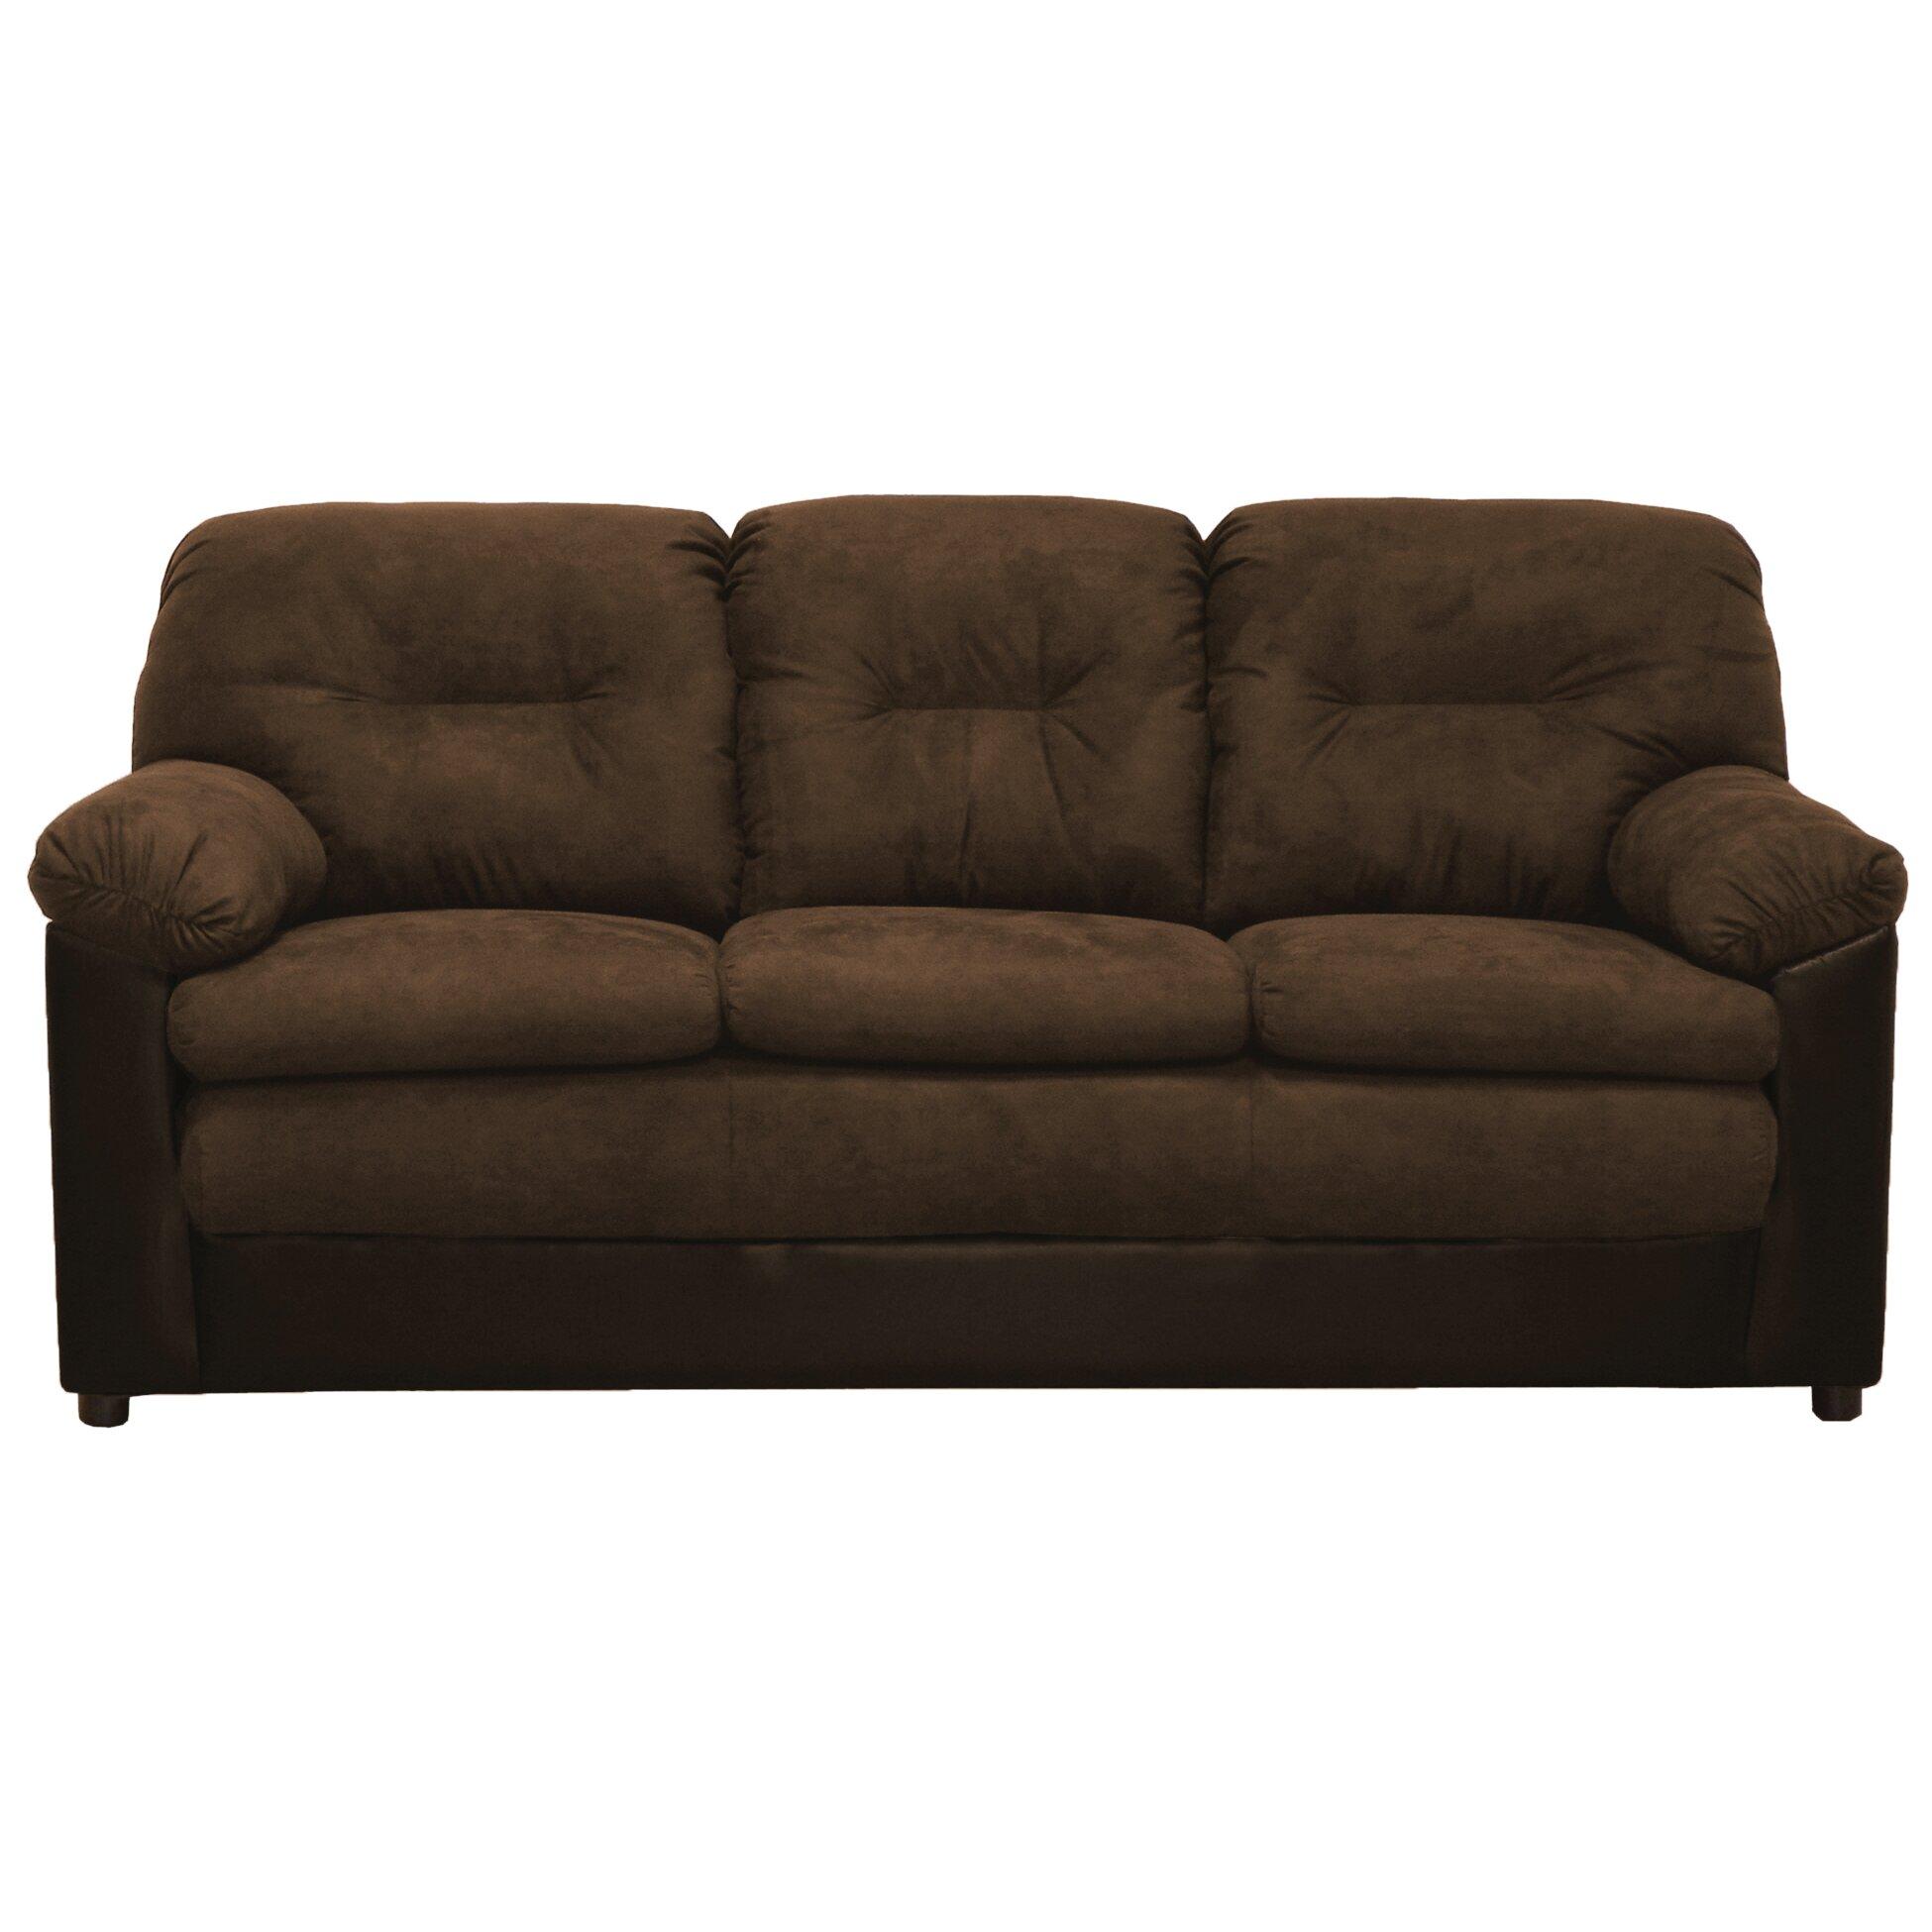 piedmont furniture claire sofa reviews wayfair On piedmont furniture